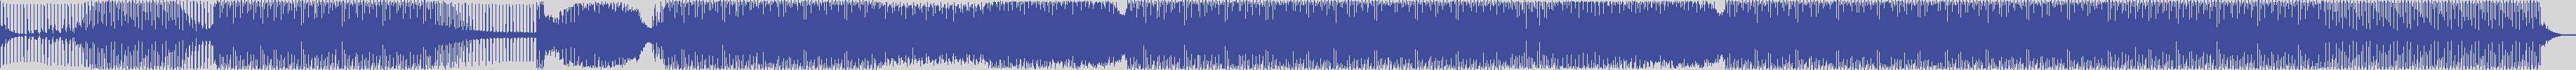 bunny_clan [BYC050] Disco Ball'z, Max Esposito - Push It Back [Original Mix] audio wave form